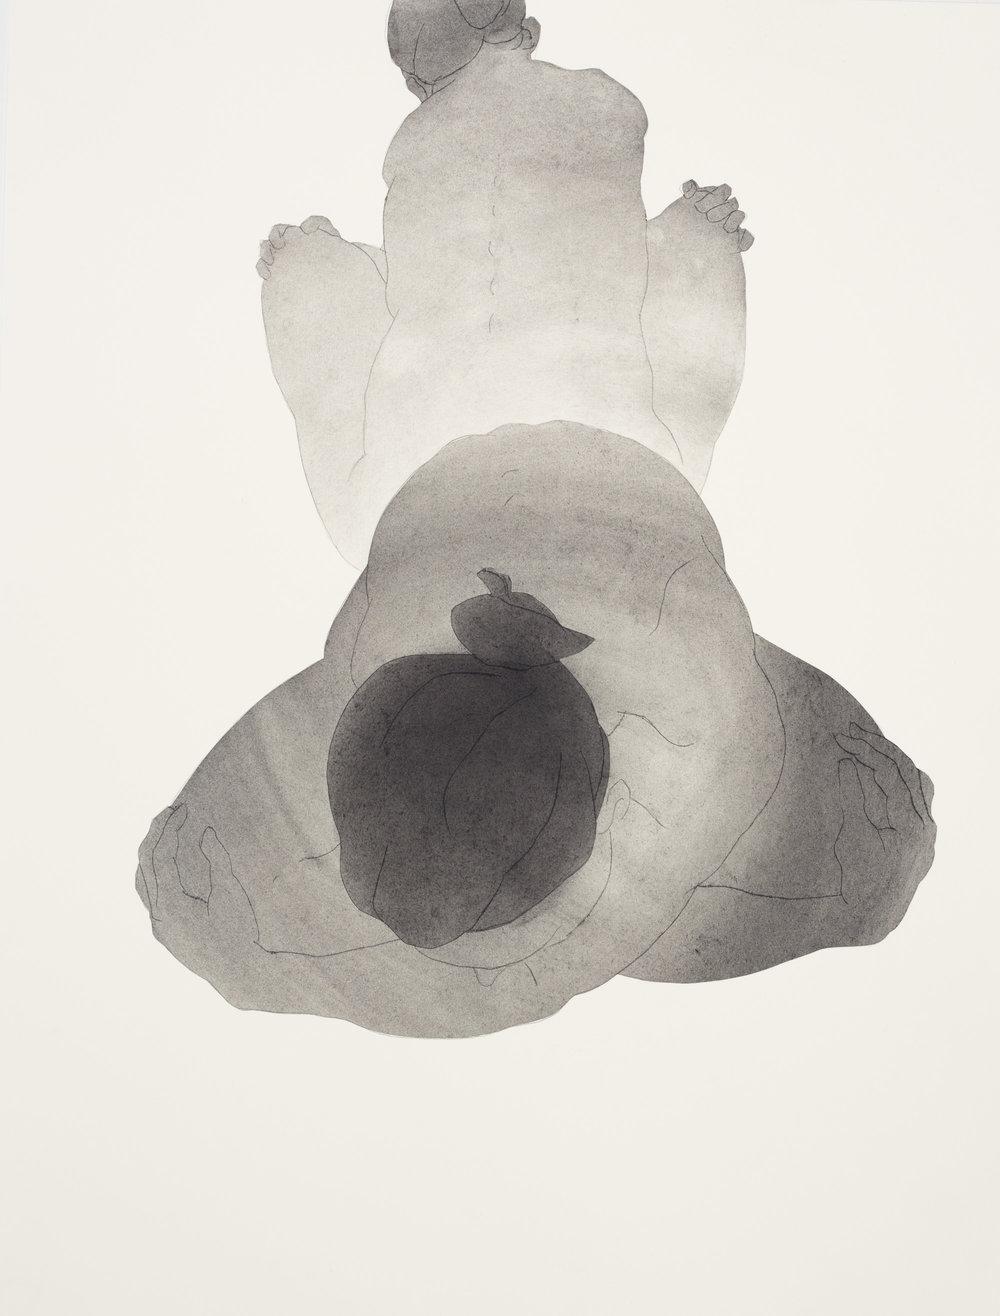 Untitled, 2014. (2014.01.003)